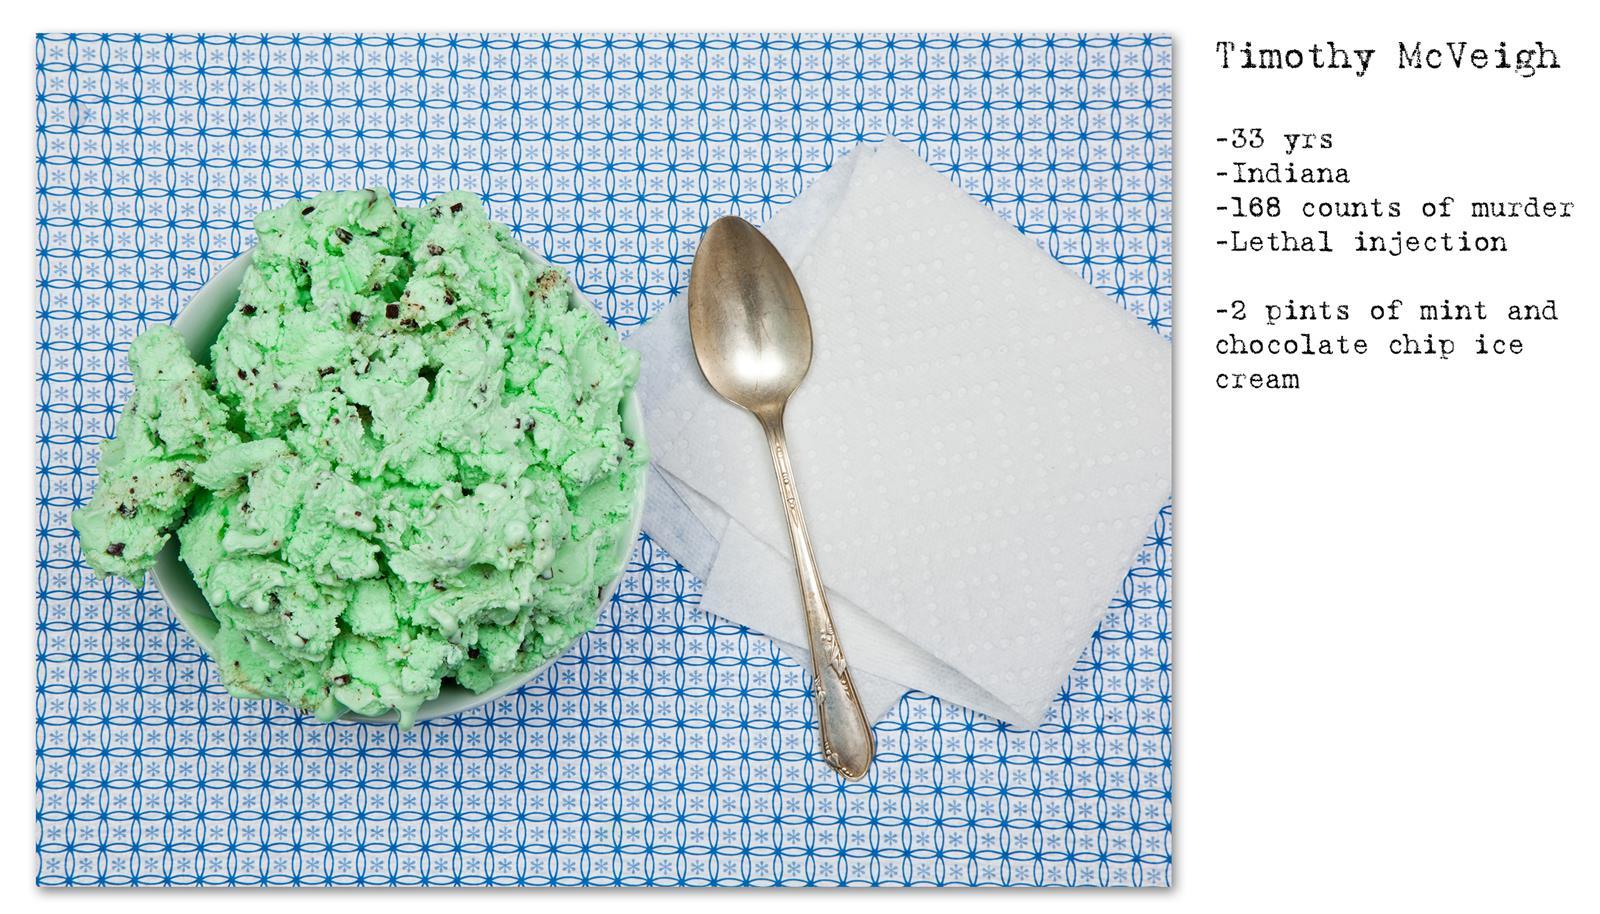 Death Row Prisoner's Last Meal (5)